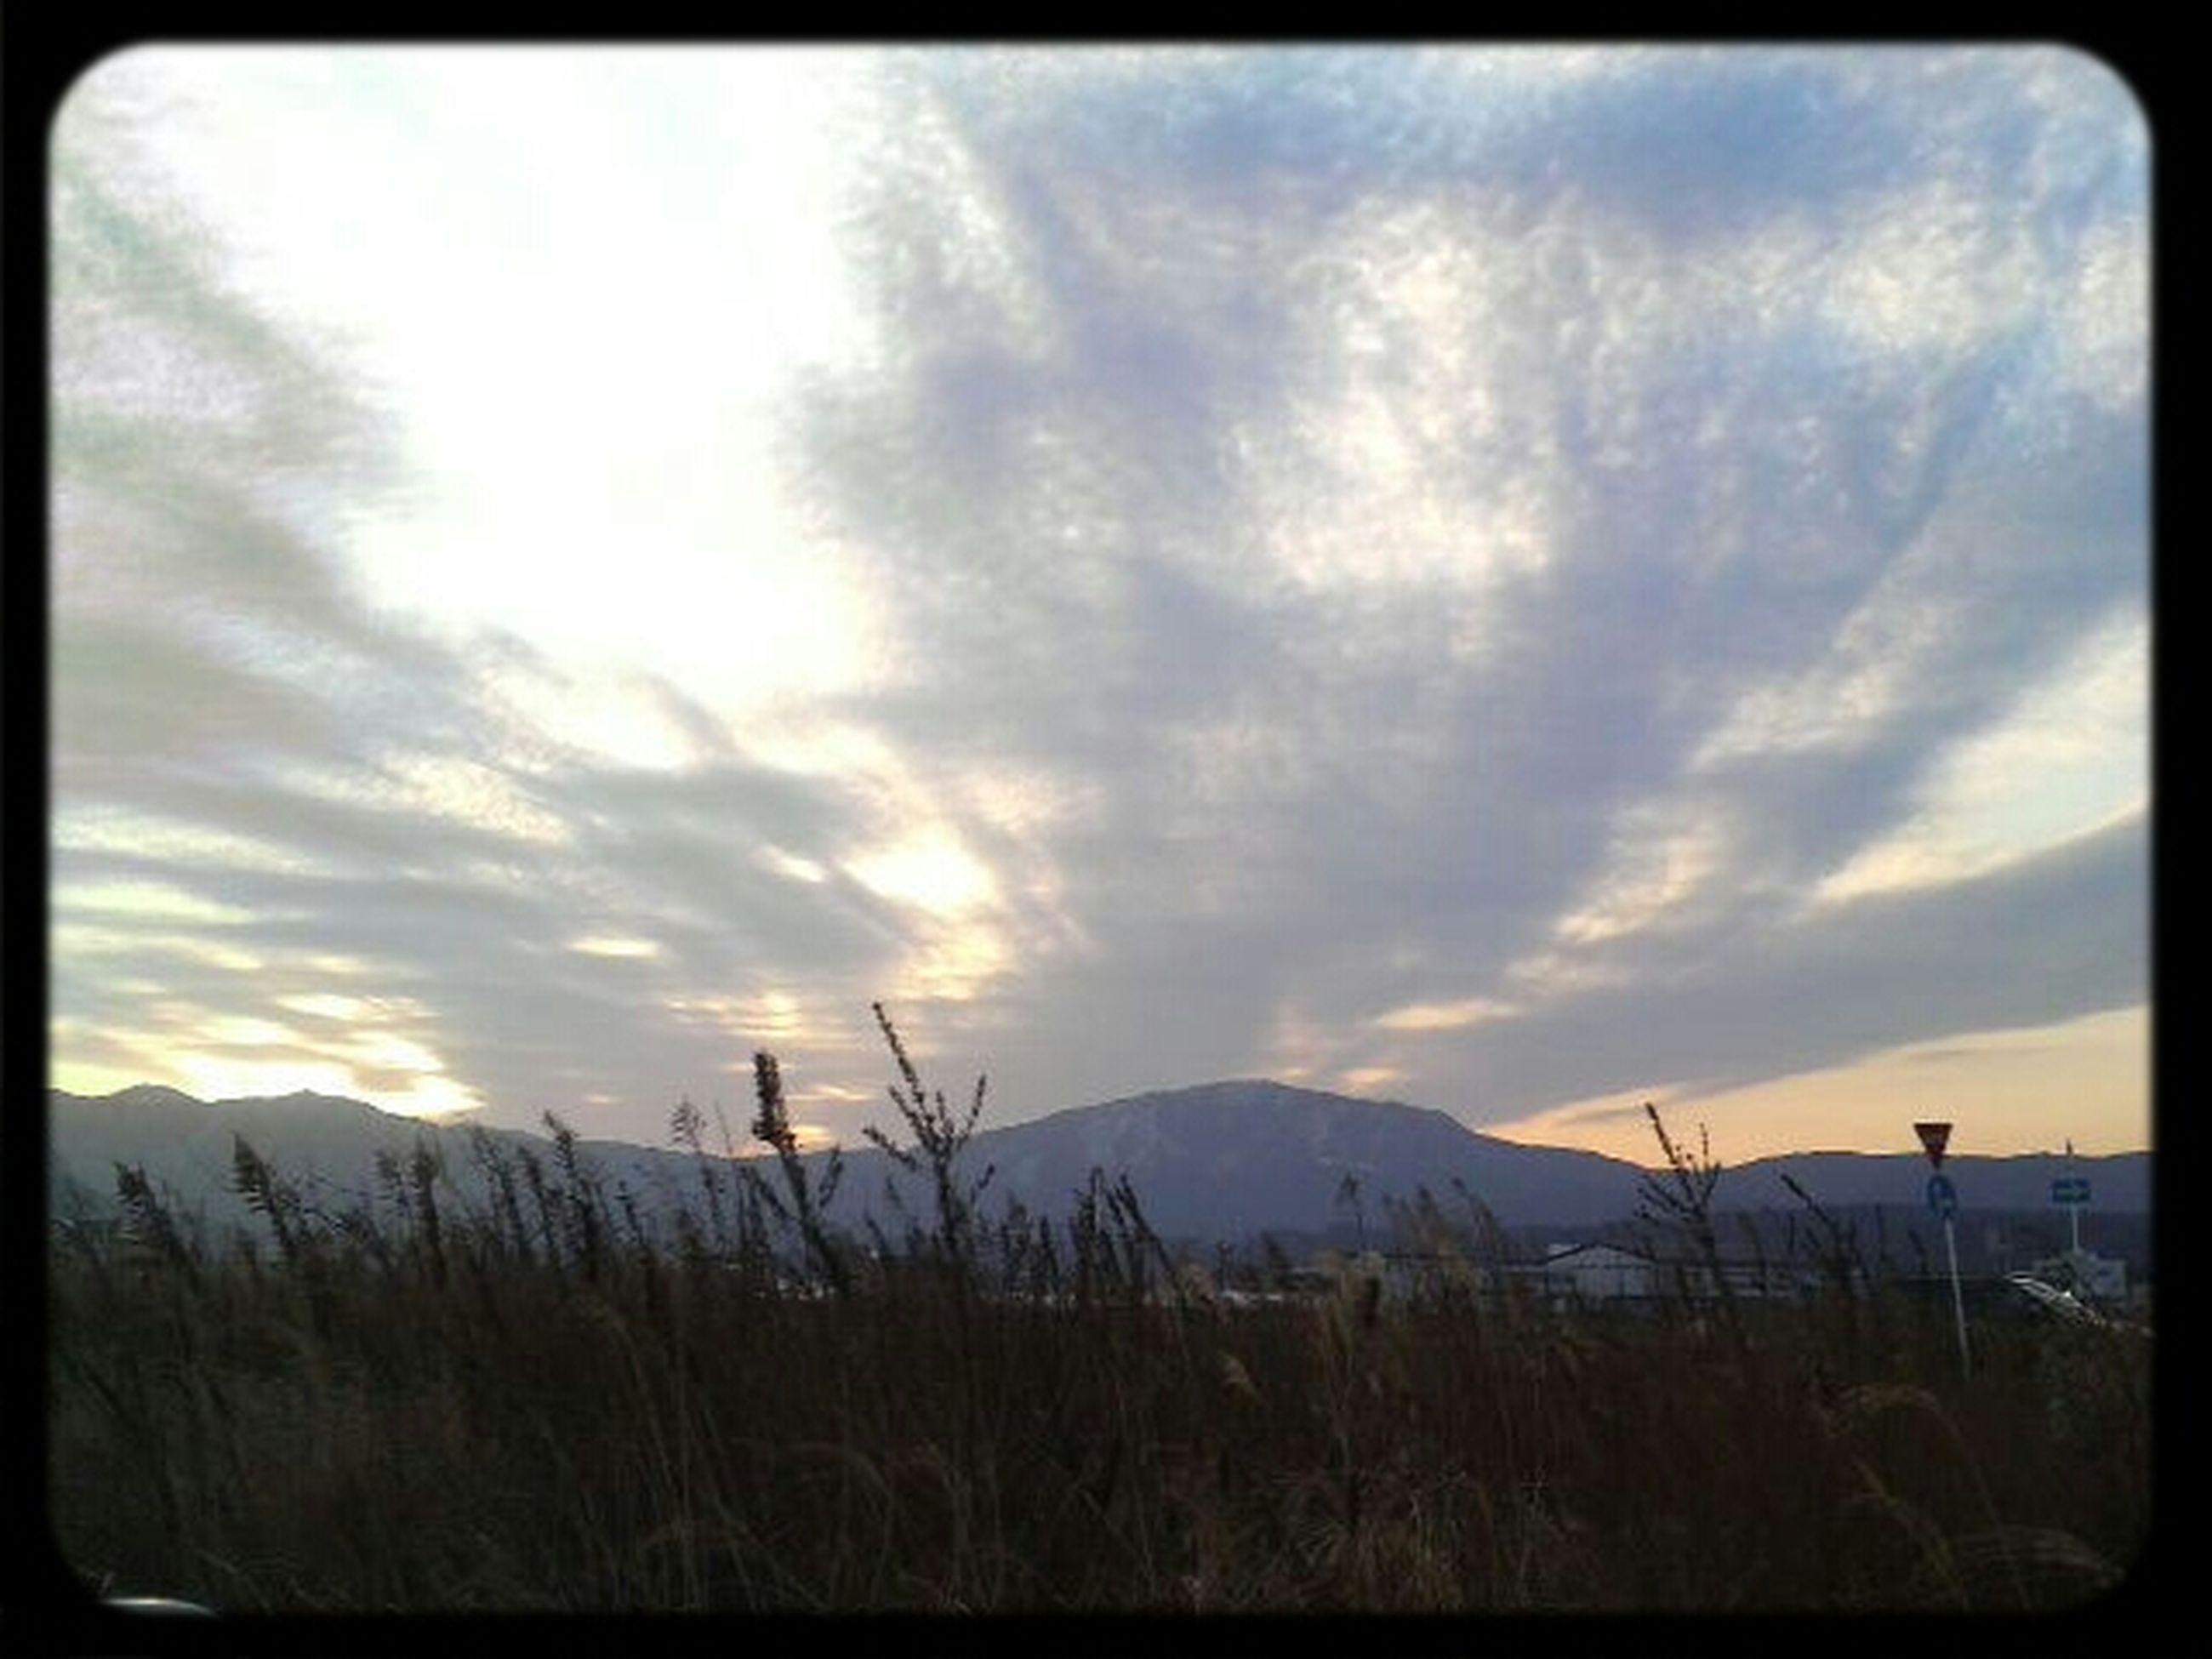 sky, tranquil scene, tranquility, landscape, scenics, beauty in nature, nature, field, plant, cloud, grass, cloud - sky, horizon over land, sunset, non-urban scene, idyllic, rural scene, growth, remote, non urban scene